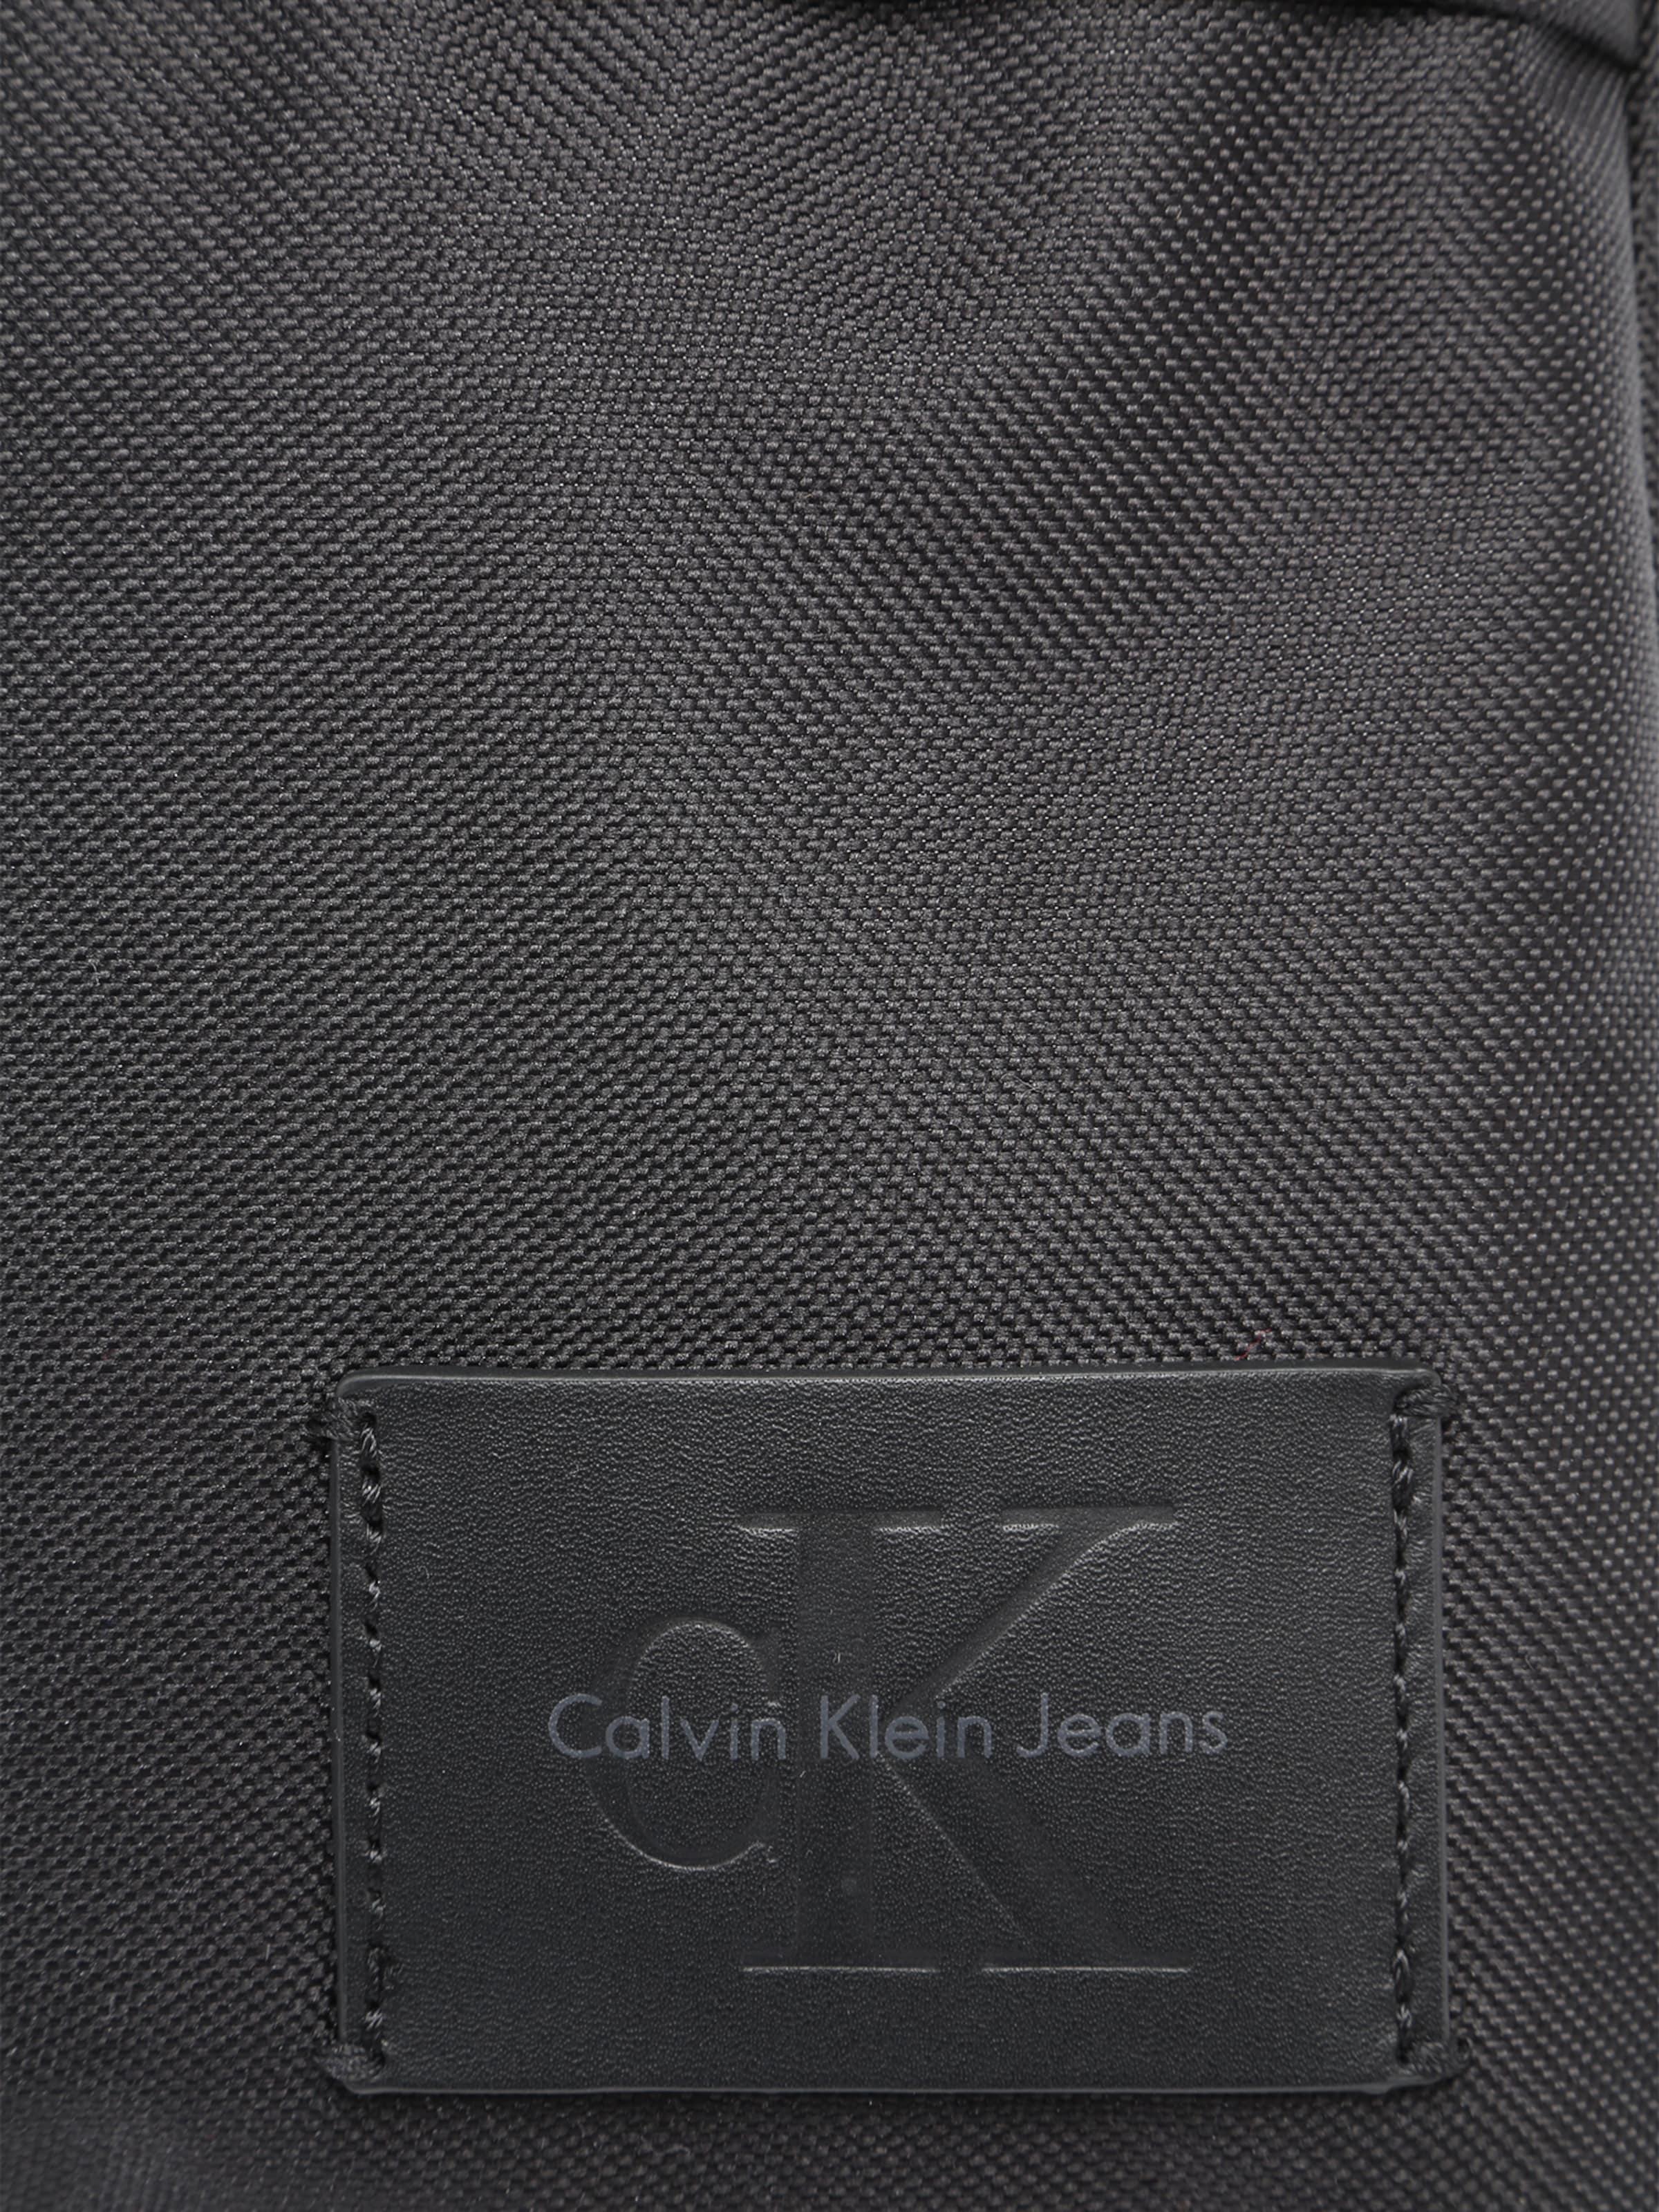 ESSENTIAL 'SPORT MICRO' Jeans Klein Umh盲ngetasche Calvin Klein Calvin wfqP4nY